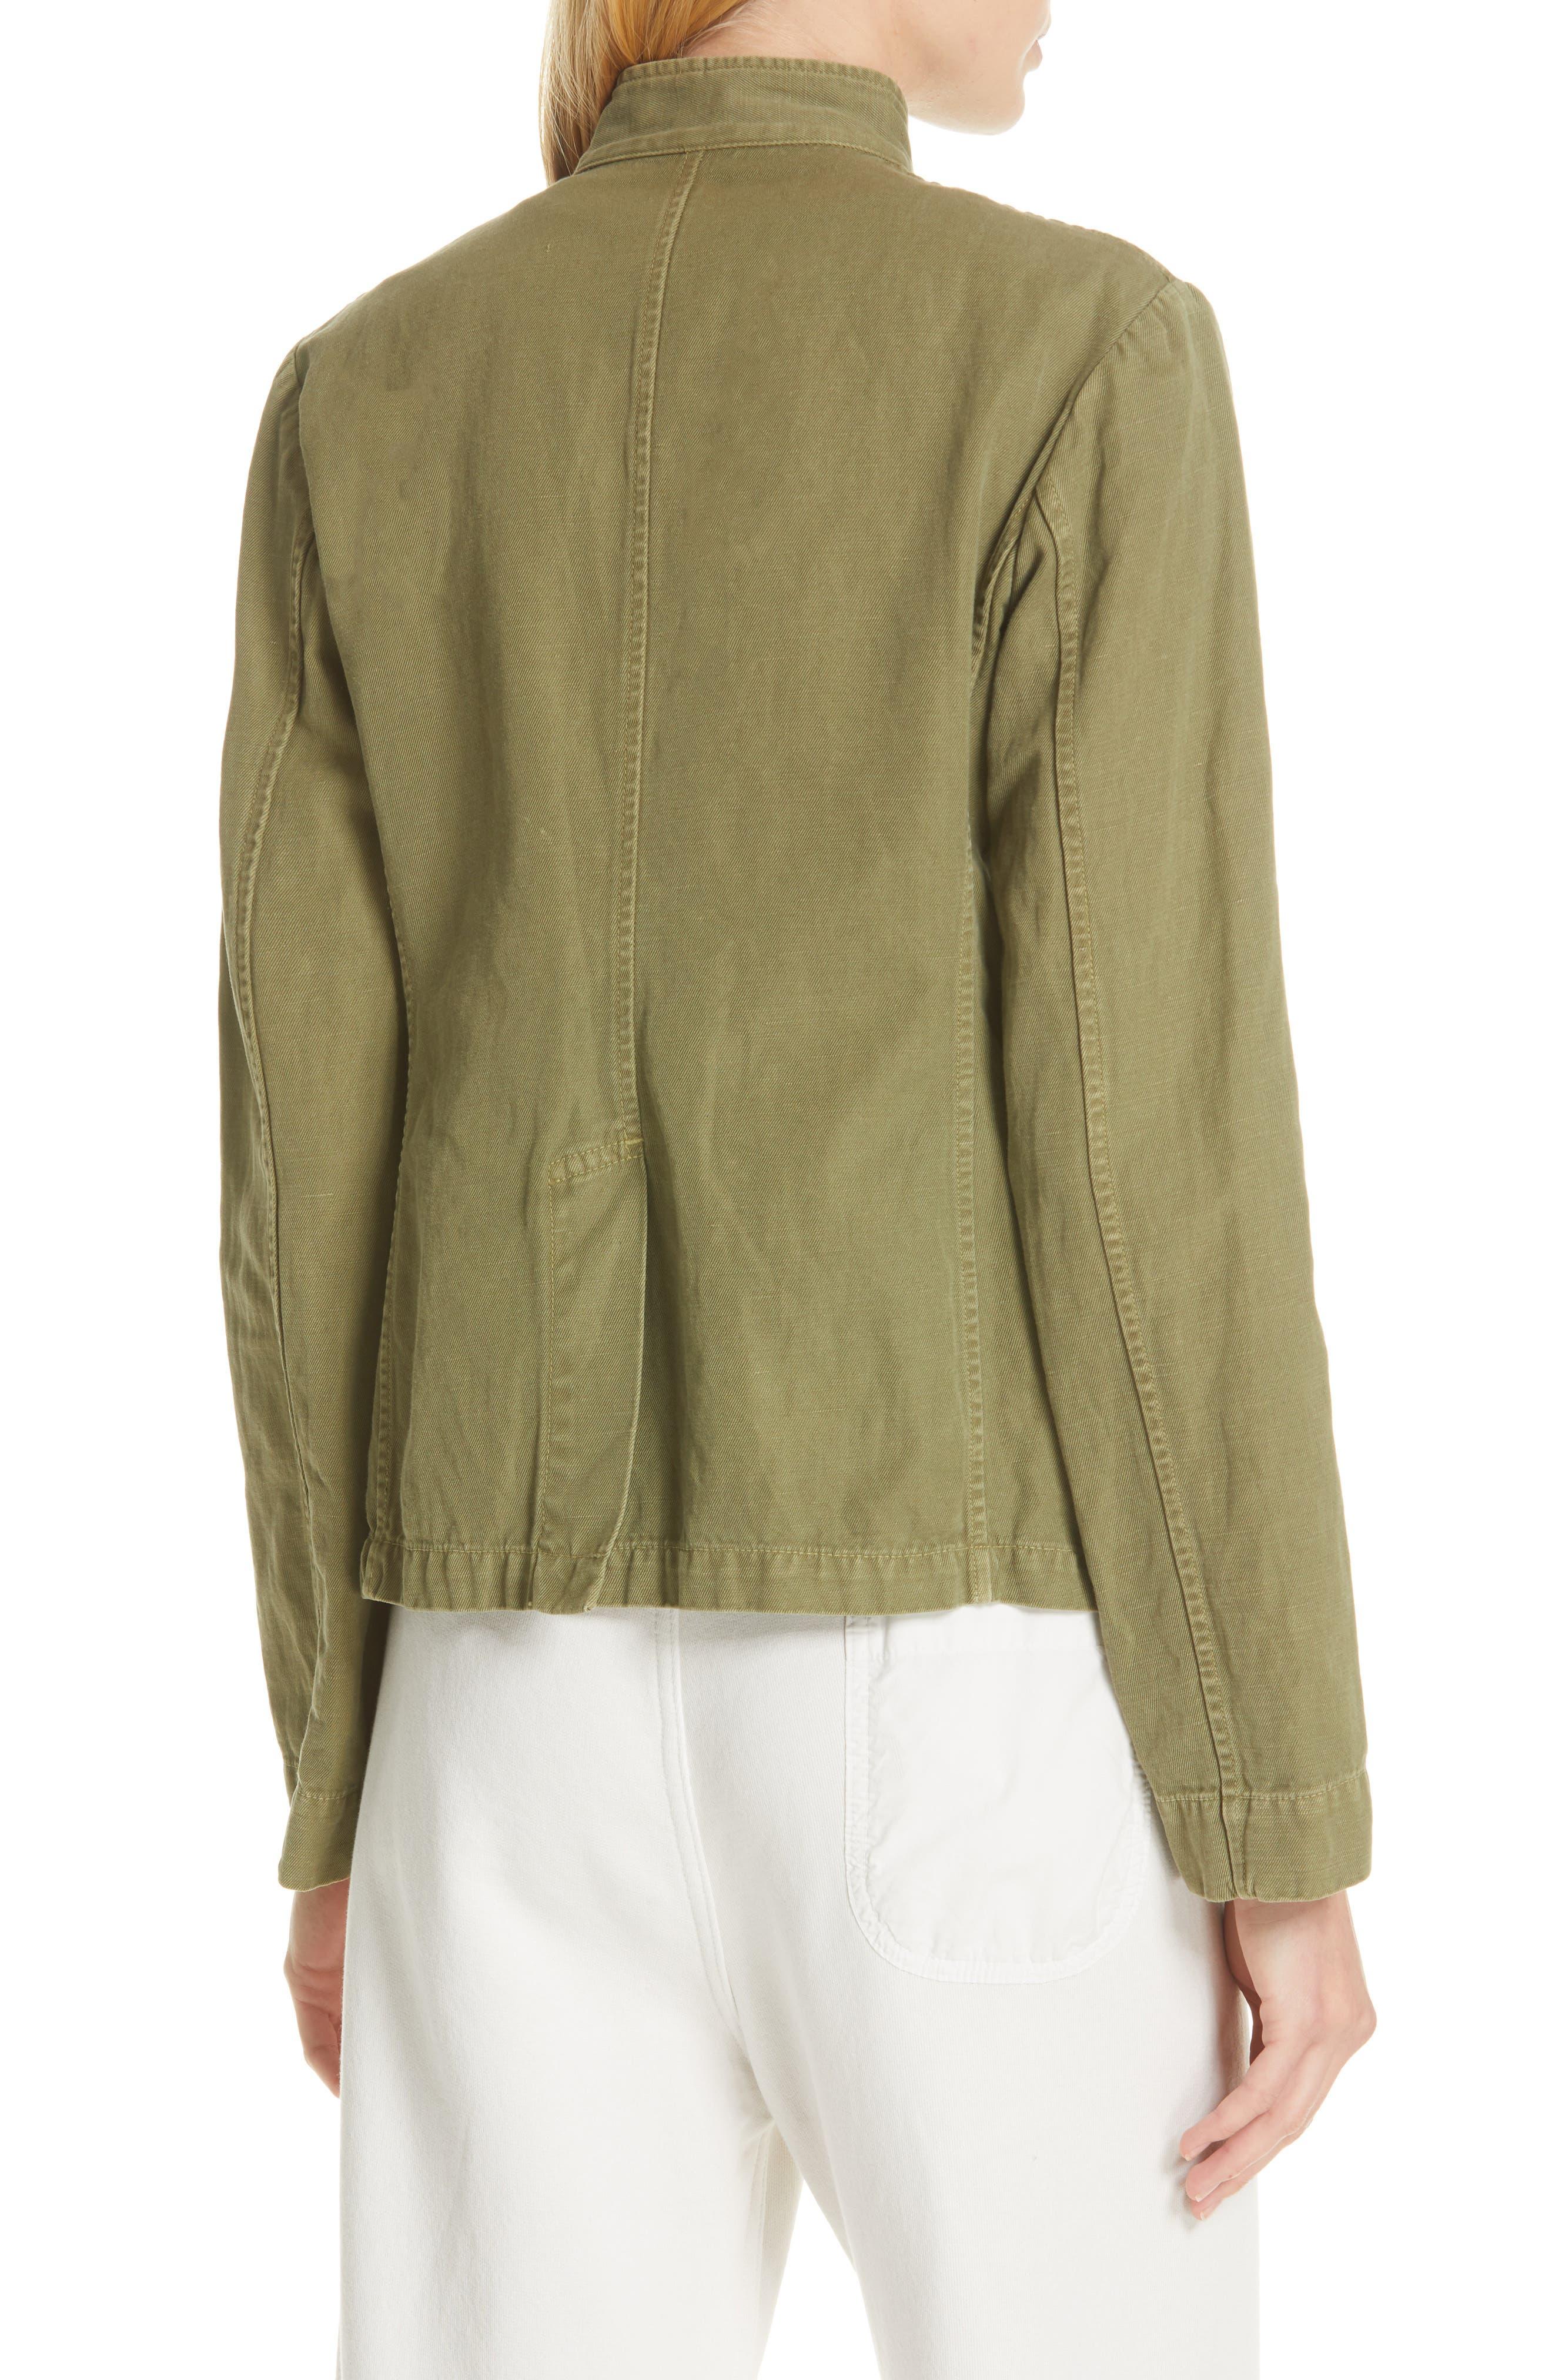 NILI LOTAN, Cambre Jacket, Alternate thumbnail 2, color, UNIFORM GREEN